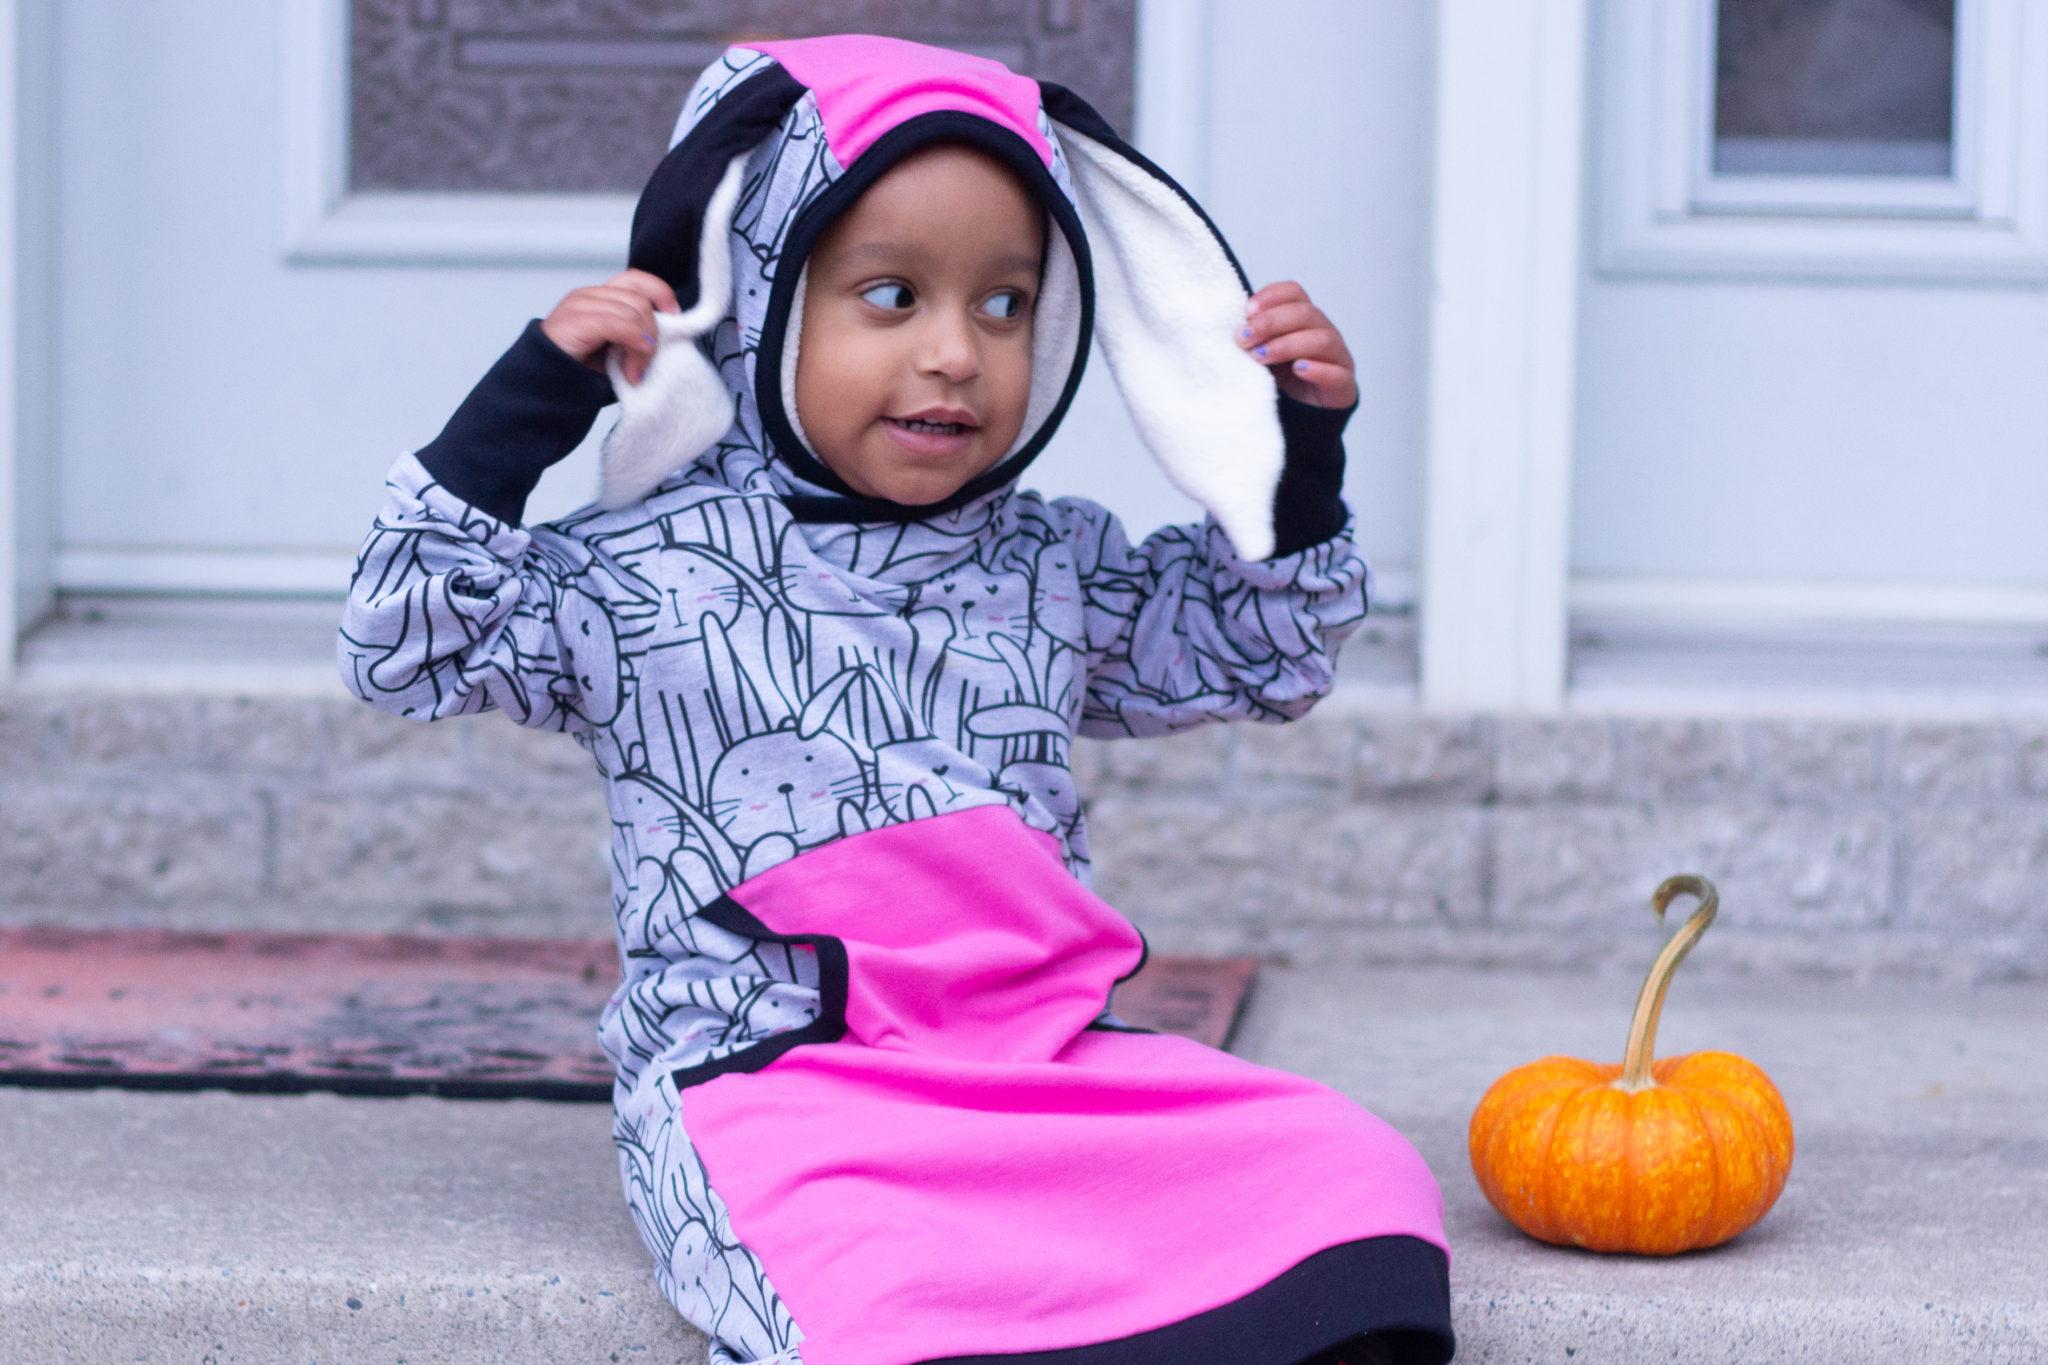 Bunny Dress And Pumpkins